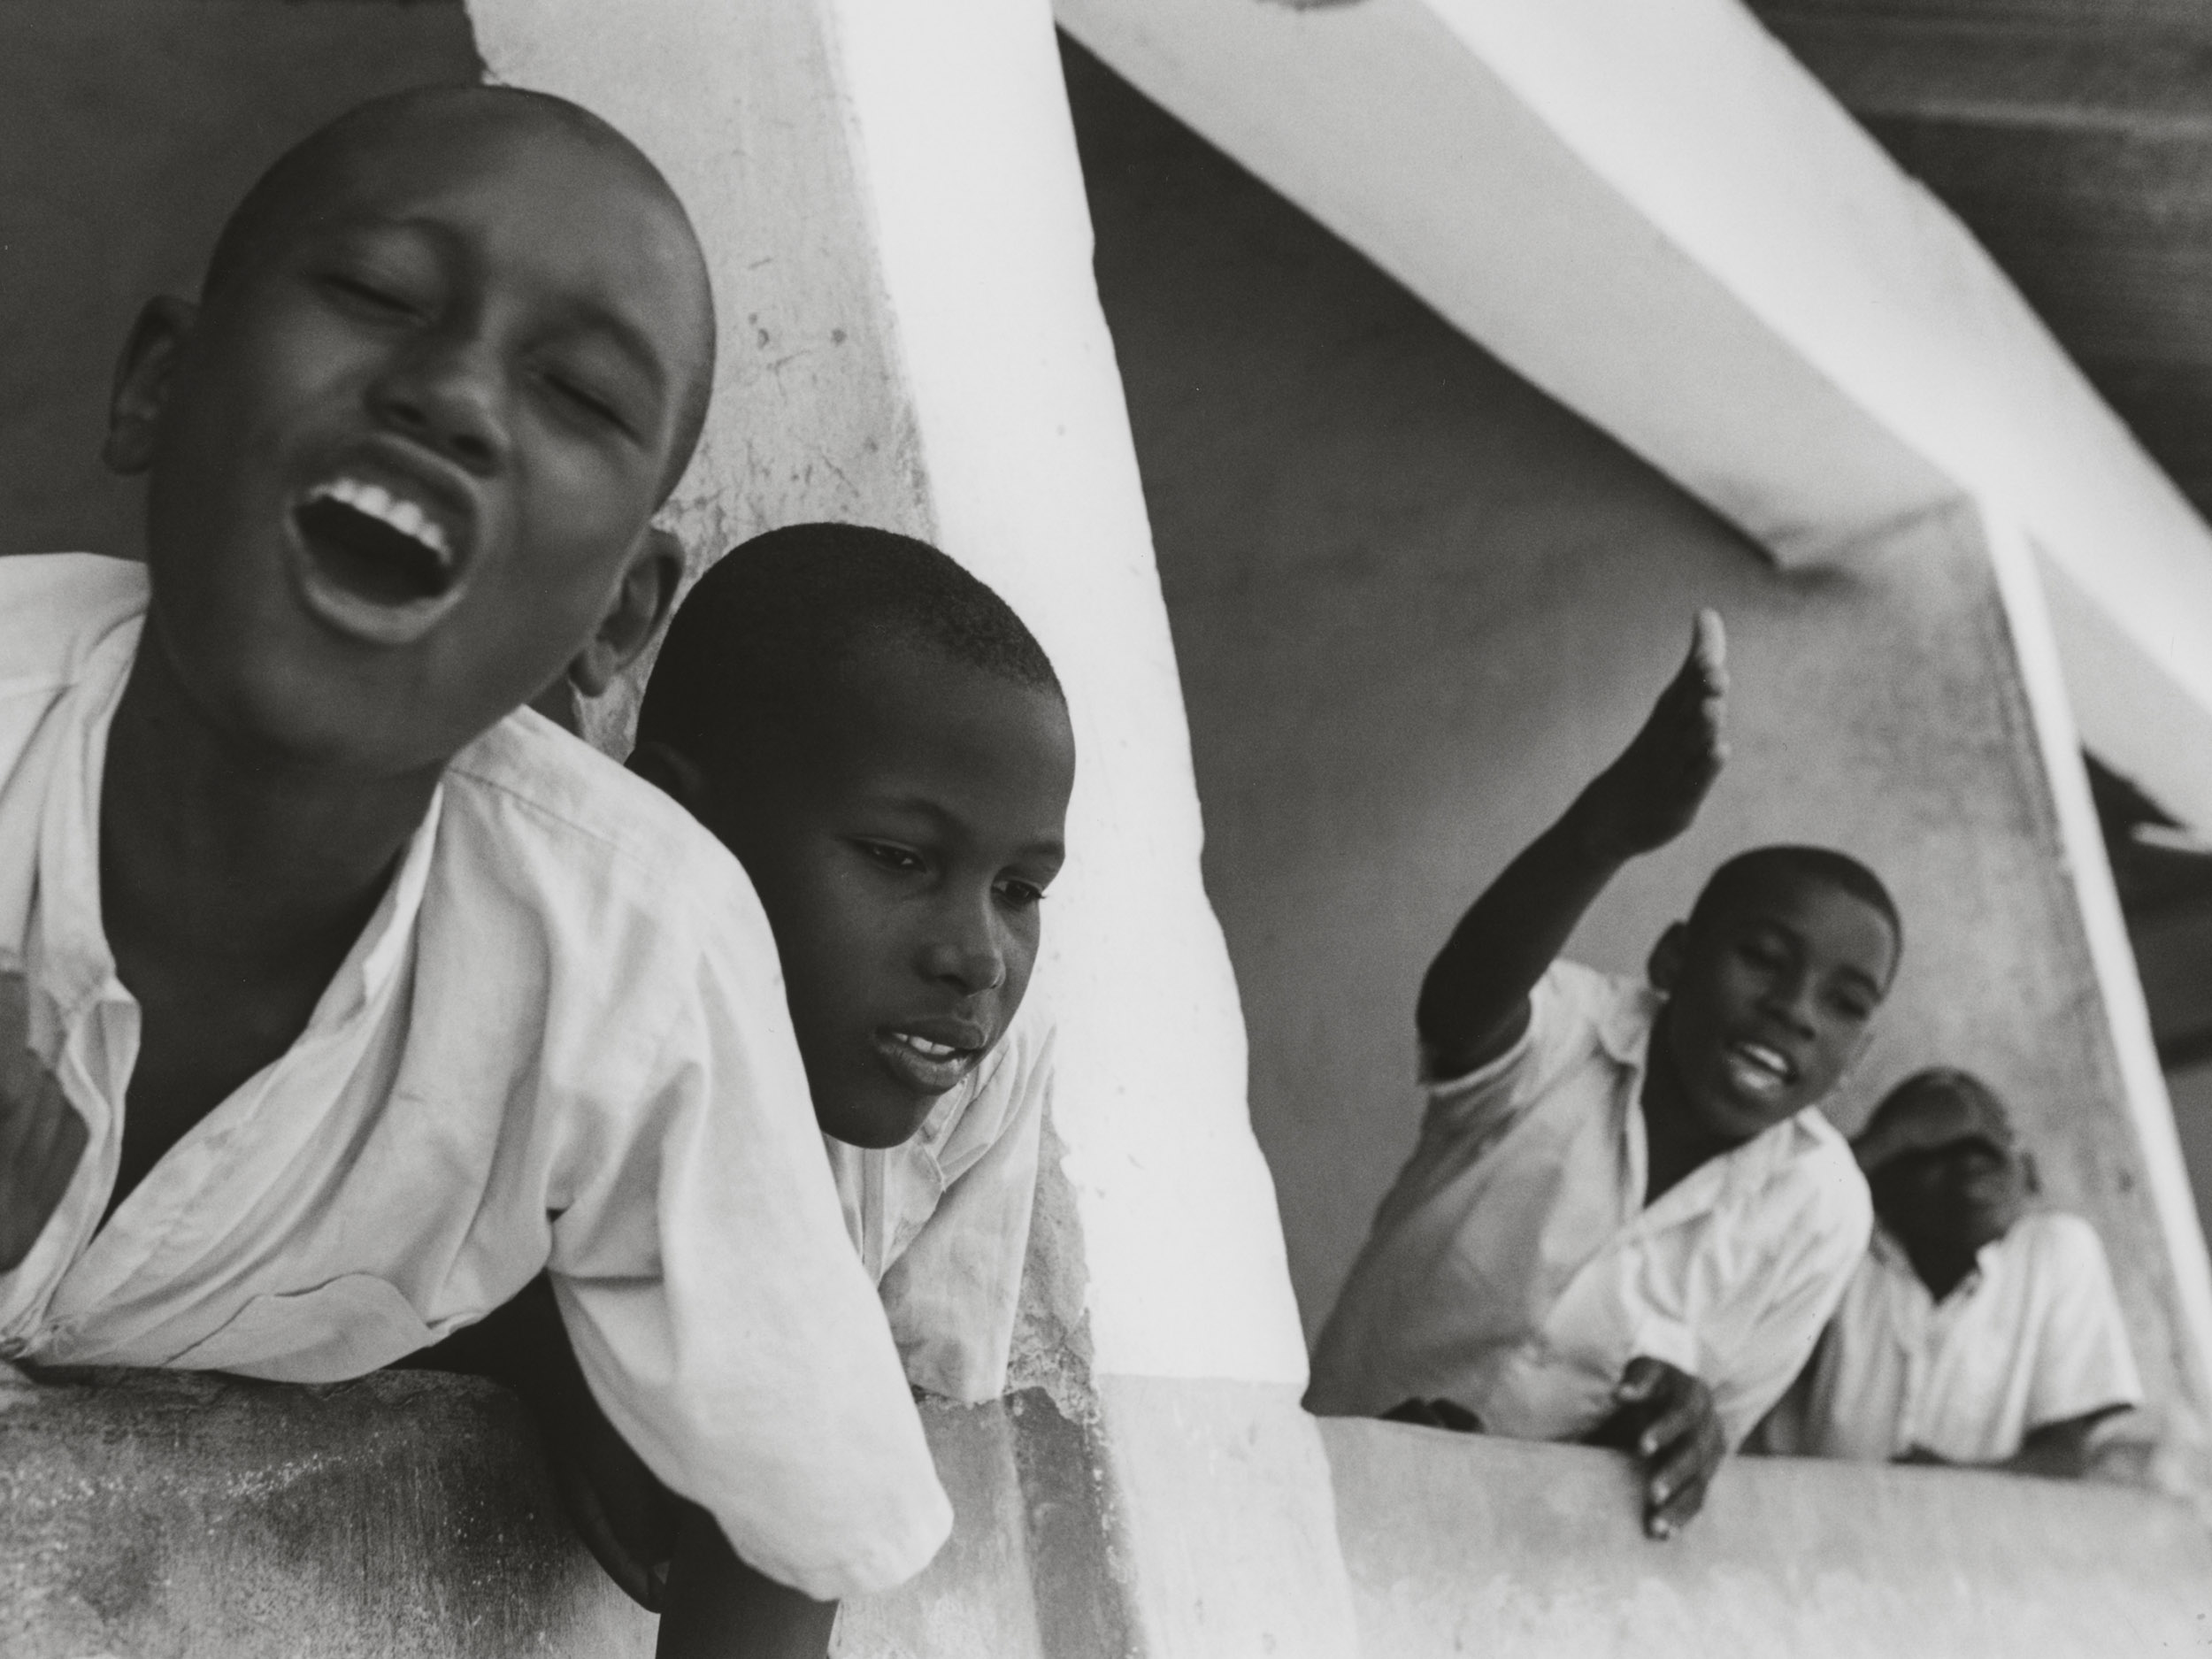 Lukasz Pukowiec captures moments of sun-soaked calm in Zanzibar